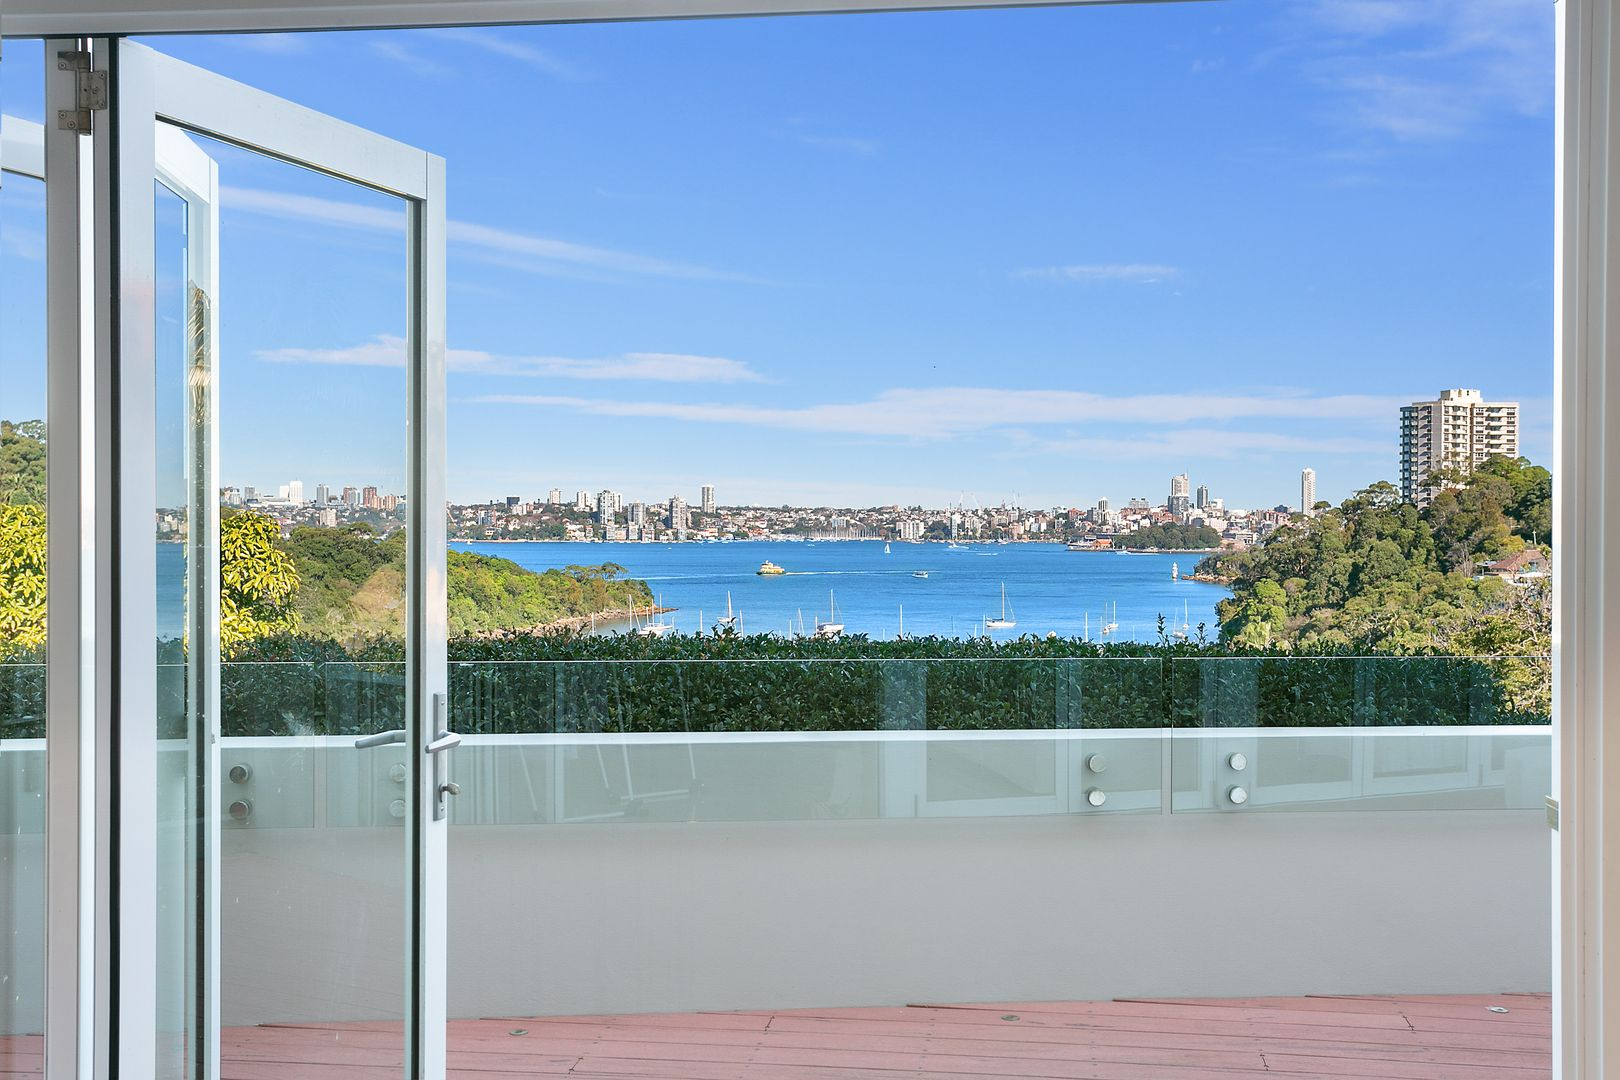 3 bedrooms Apartment / Unit / Flat in 3/11 Clanalpine Street MOSMAN NSW, 2088